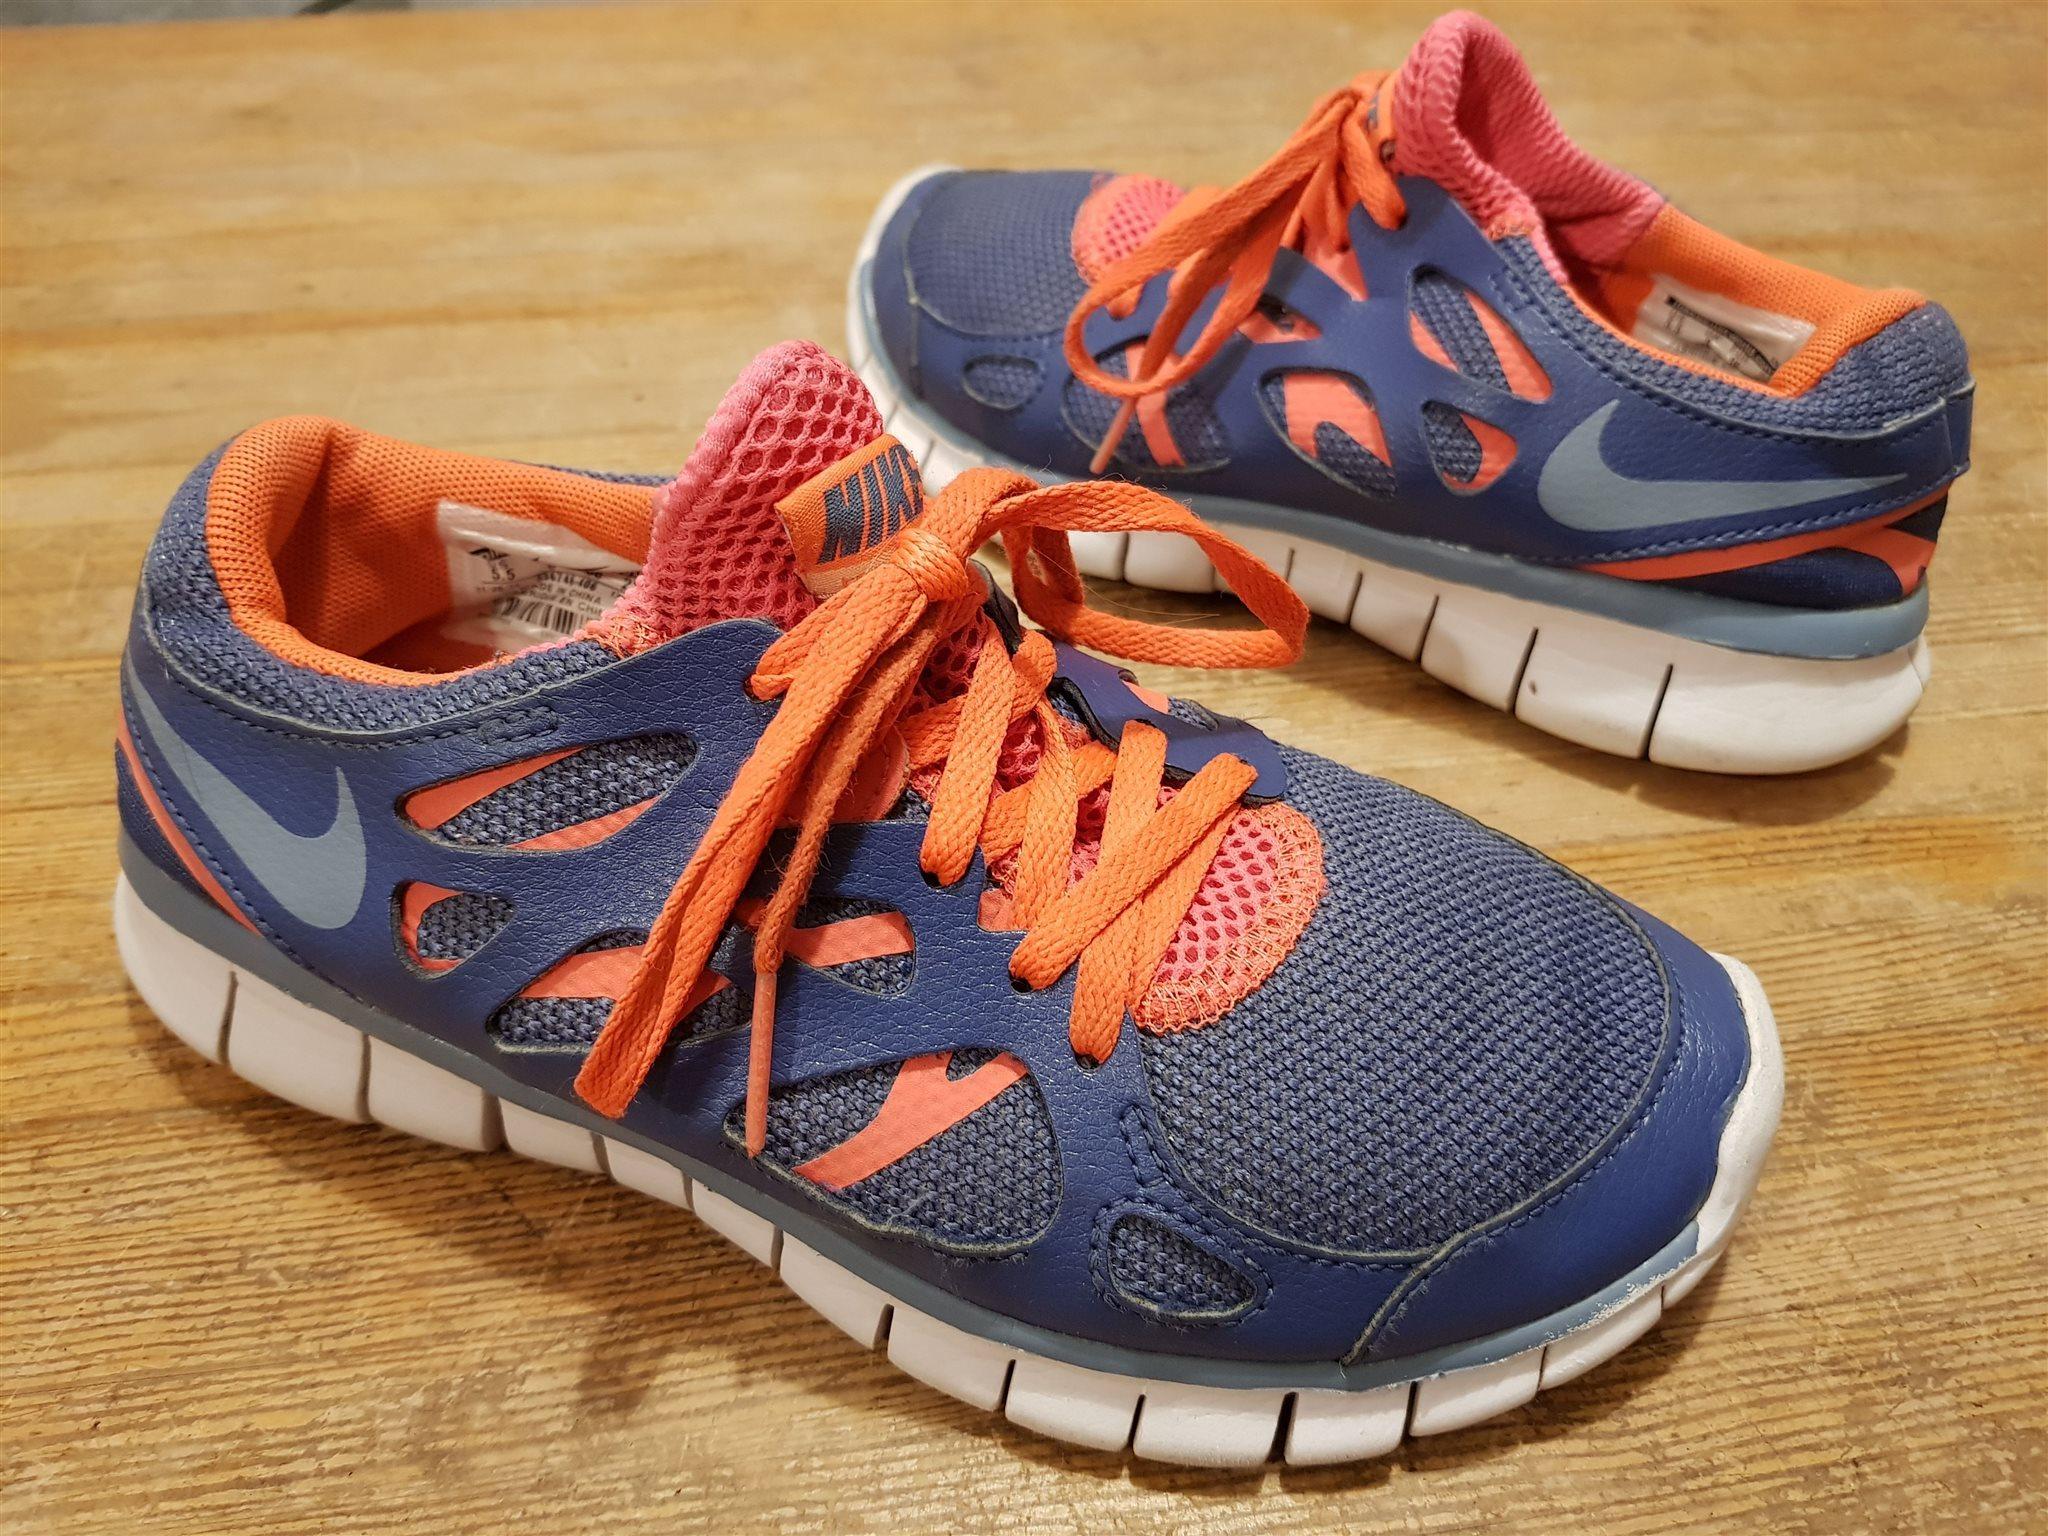 hot sale online 990c2 c3aea Löparskor sportskor Nike Free Run 2 fritidsskor str 36 i fint skick